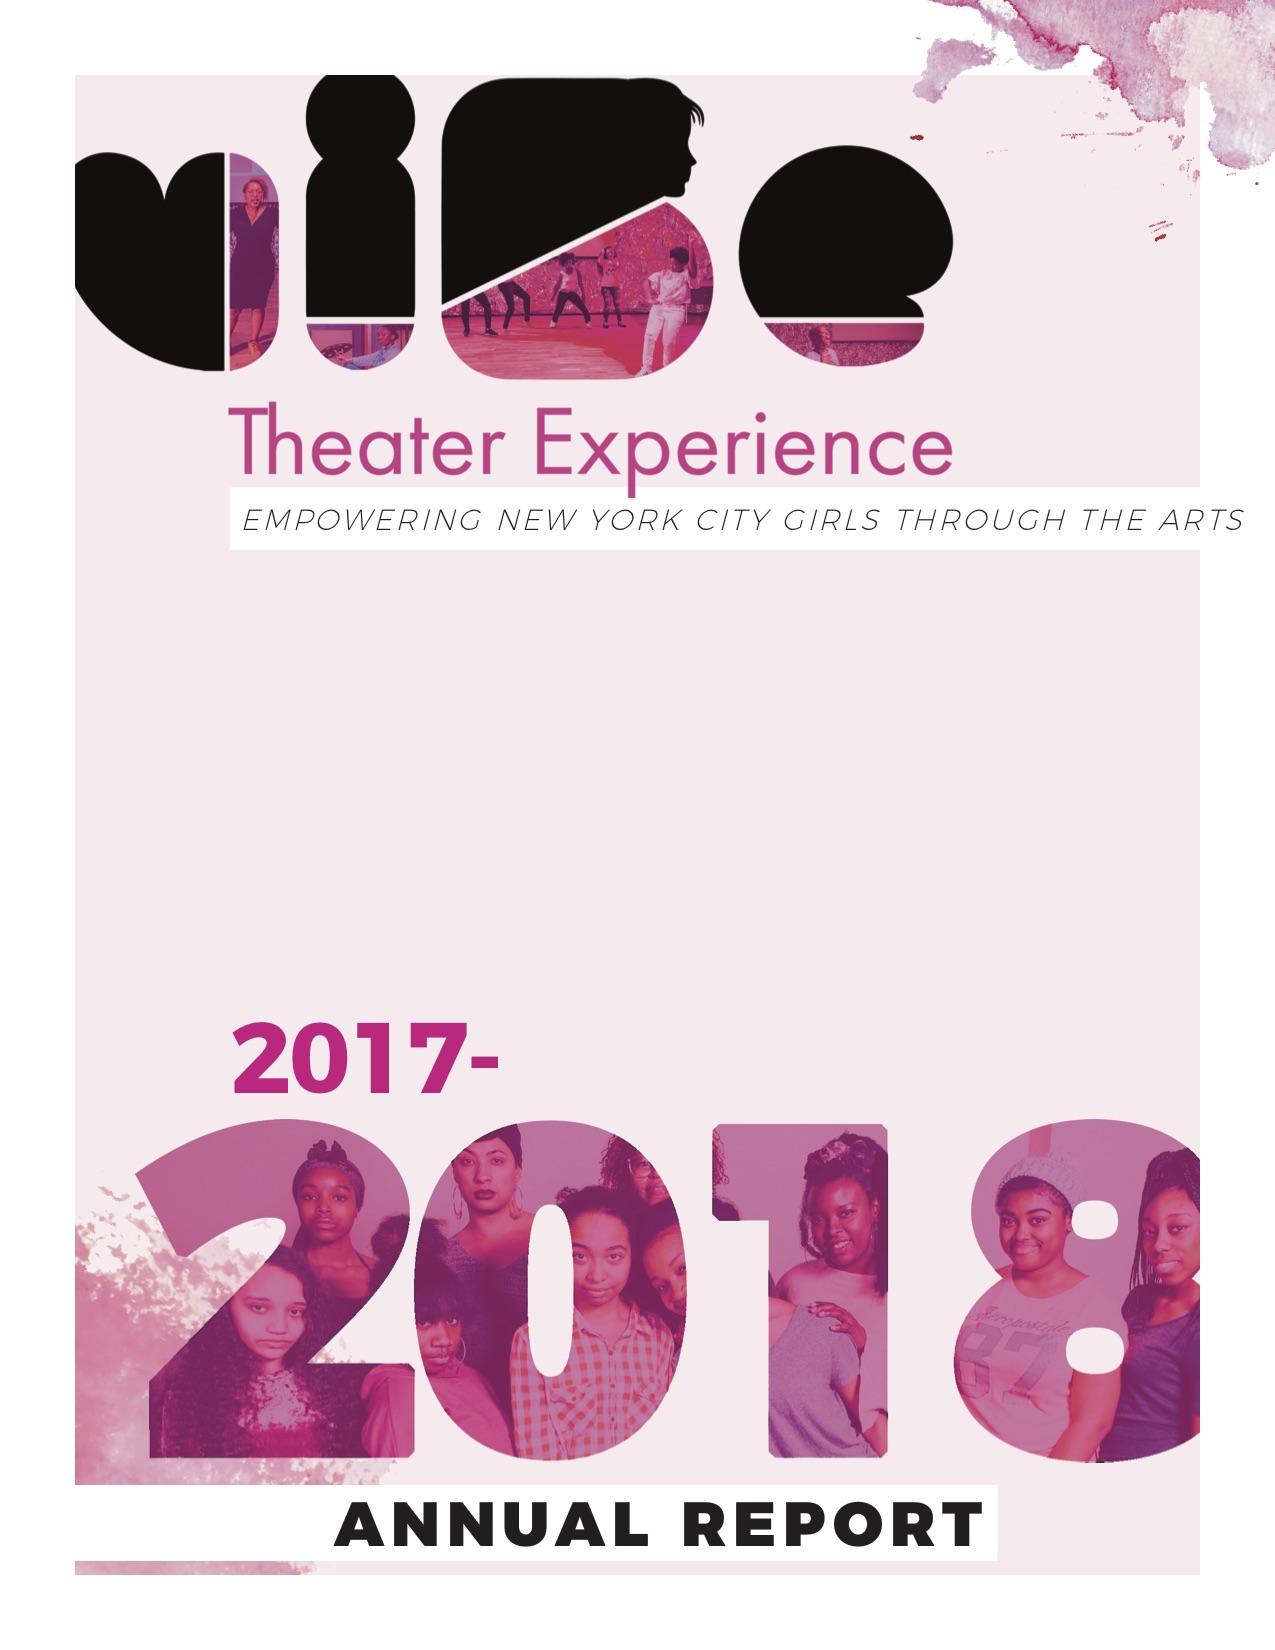 viBe+2018+Annual+Report_DIGITAL+(spread).jpg